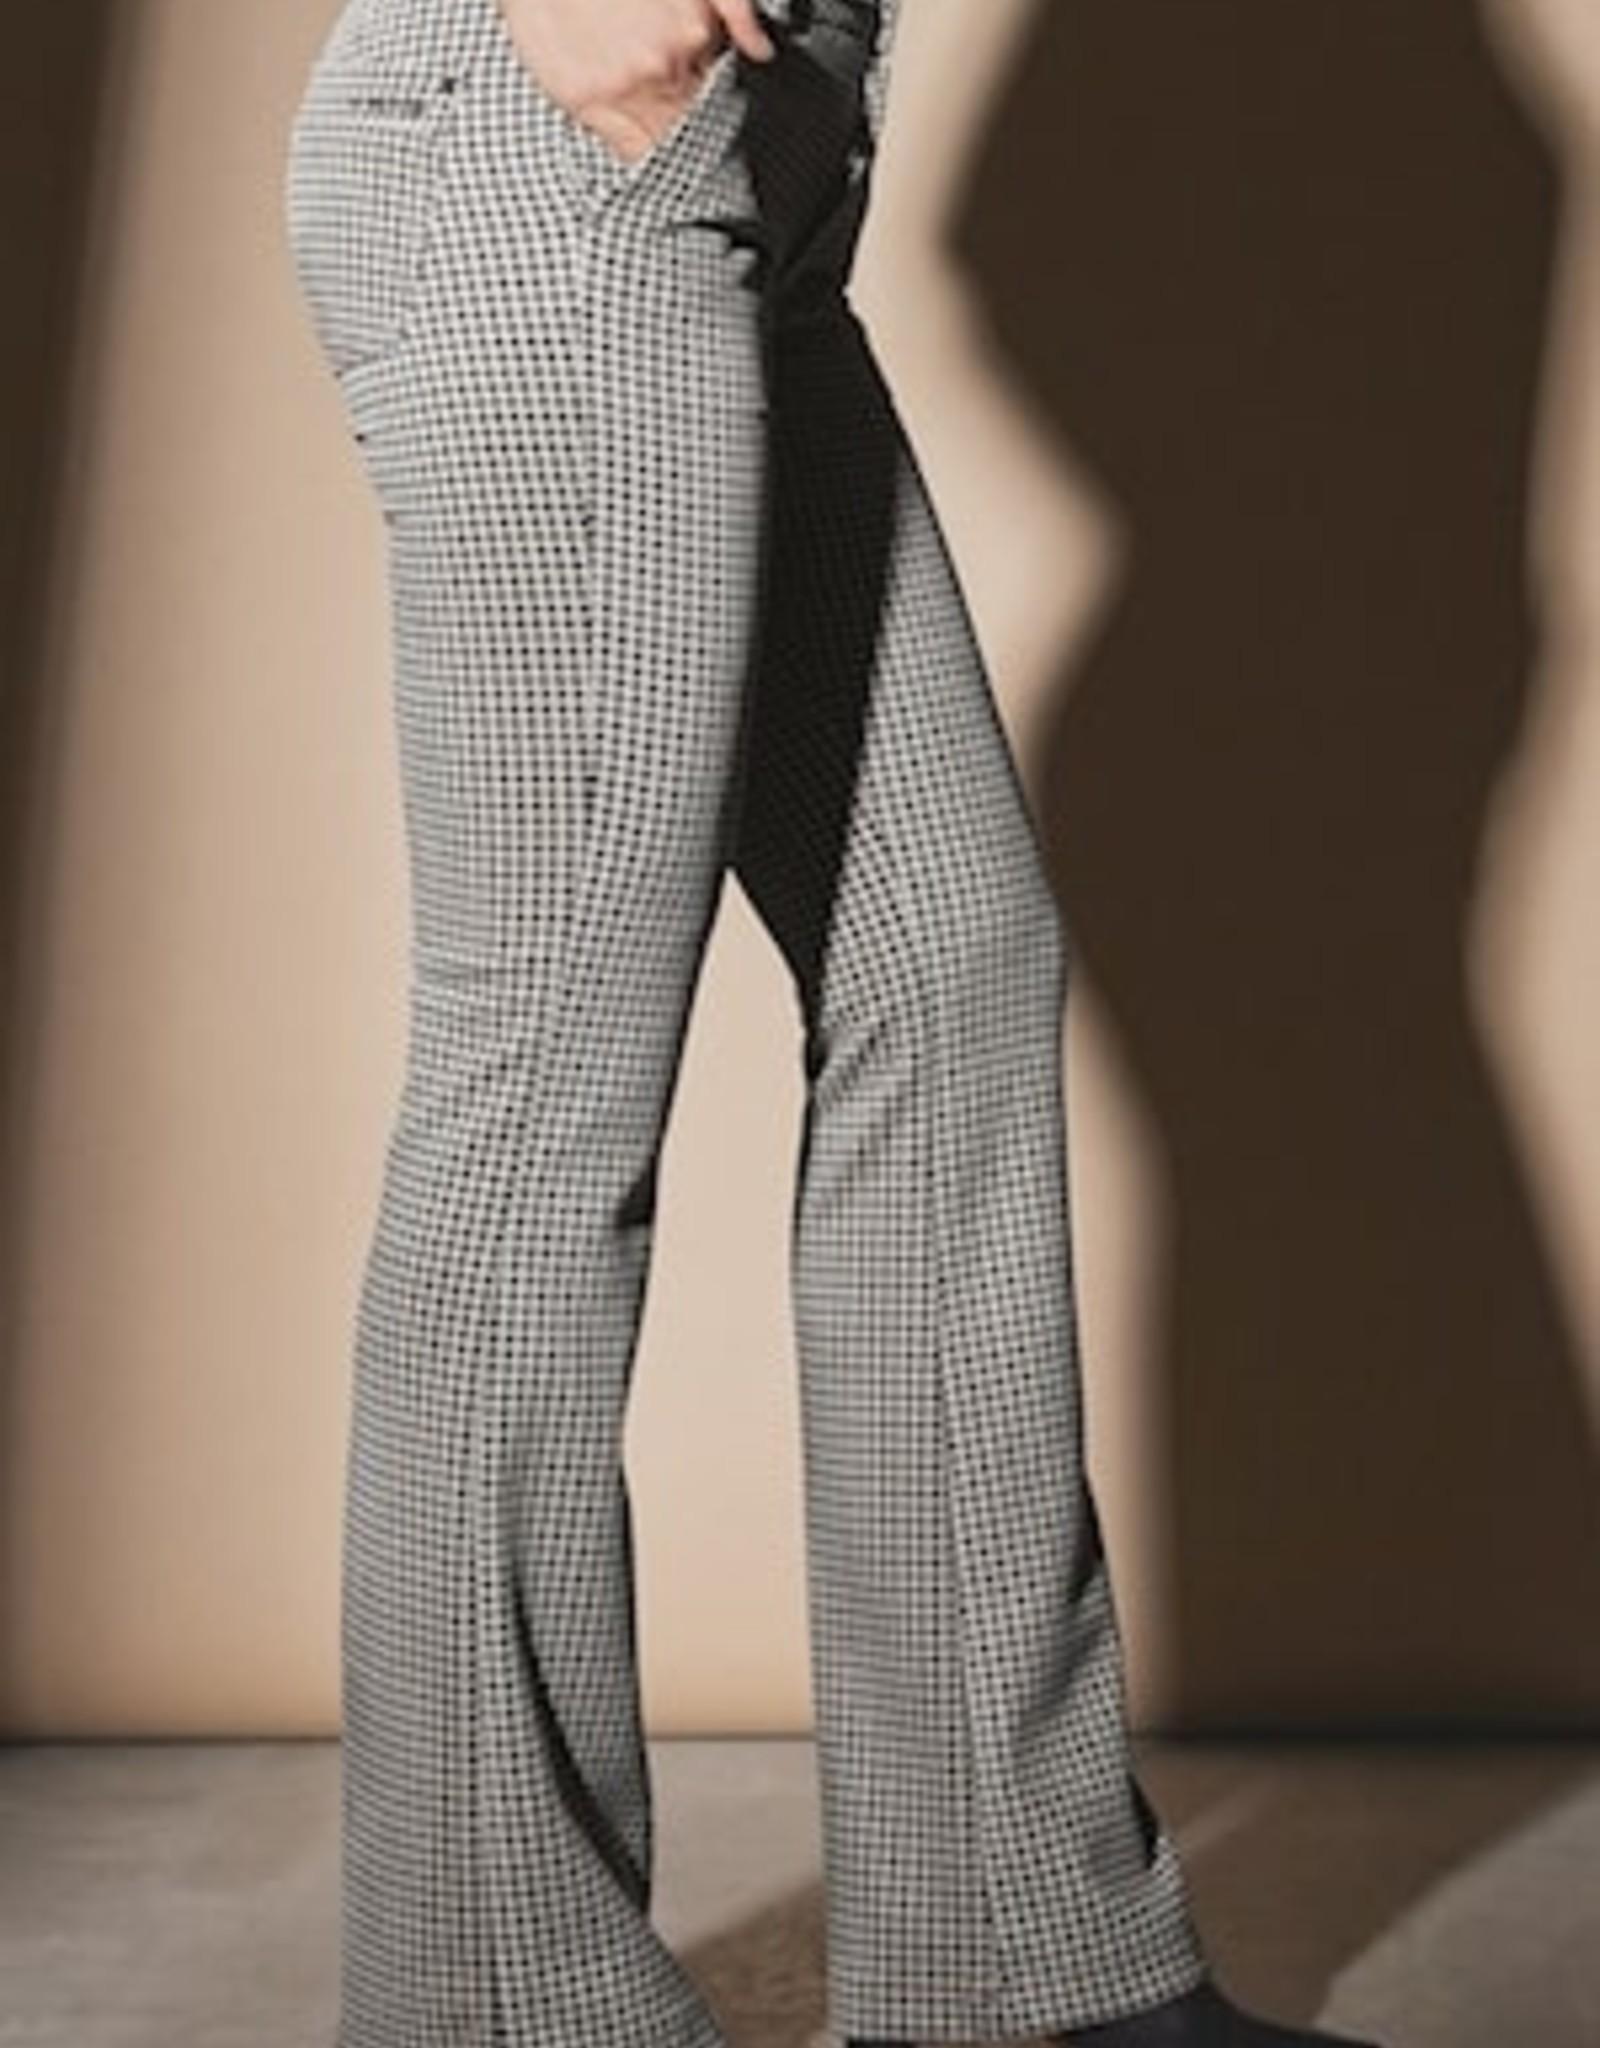 Para MI Pantalon Jade City  Brushed Quality Off White Zwart Pied De Poule